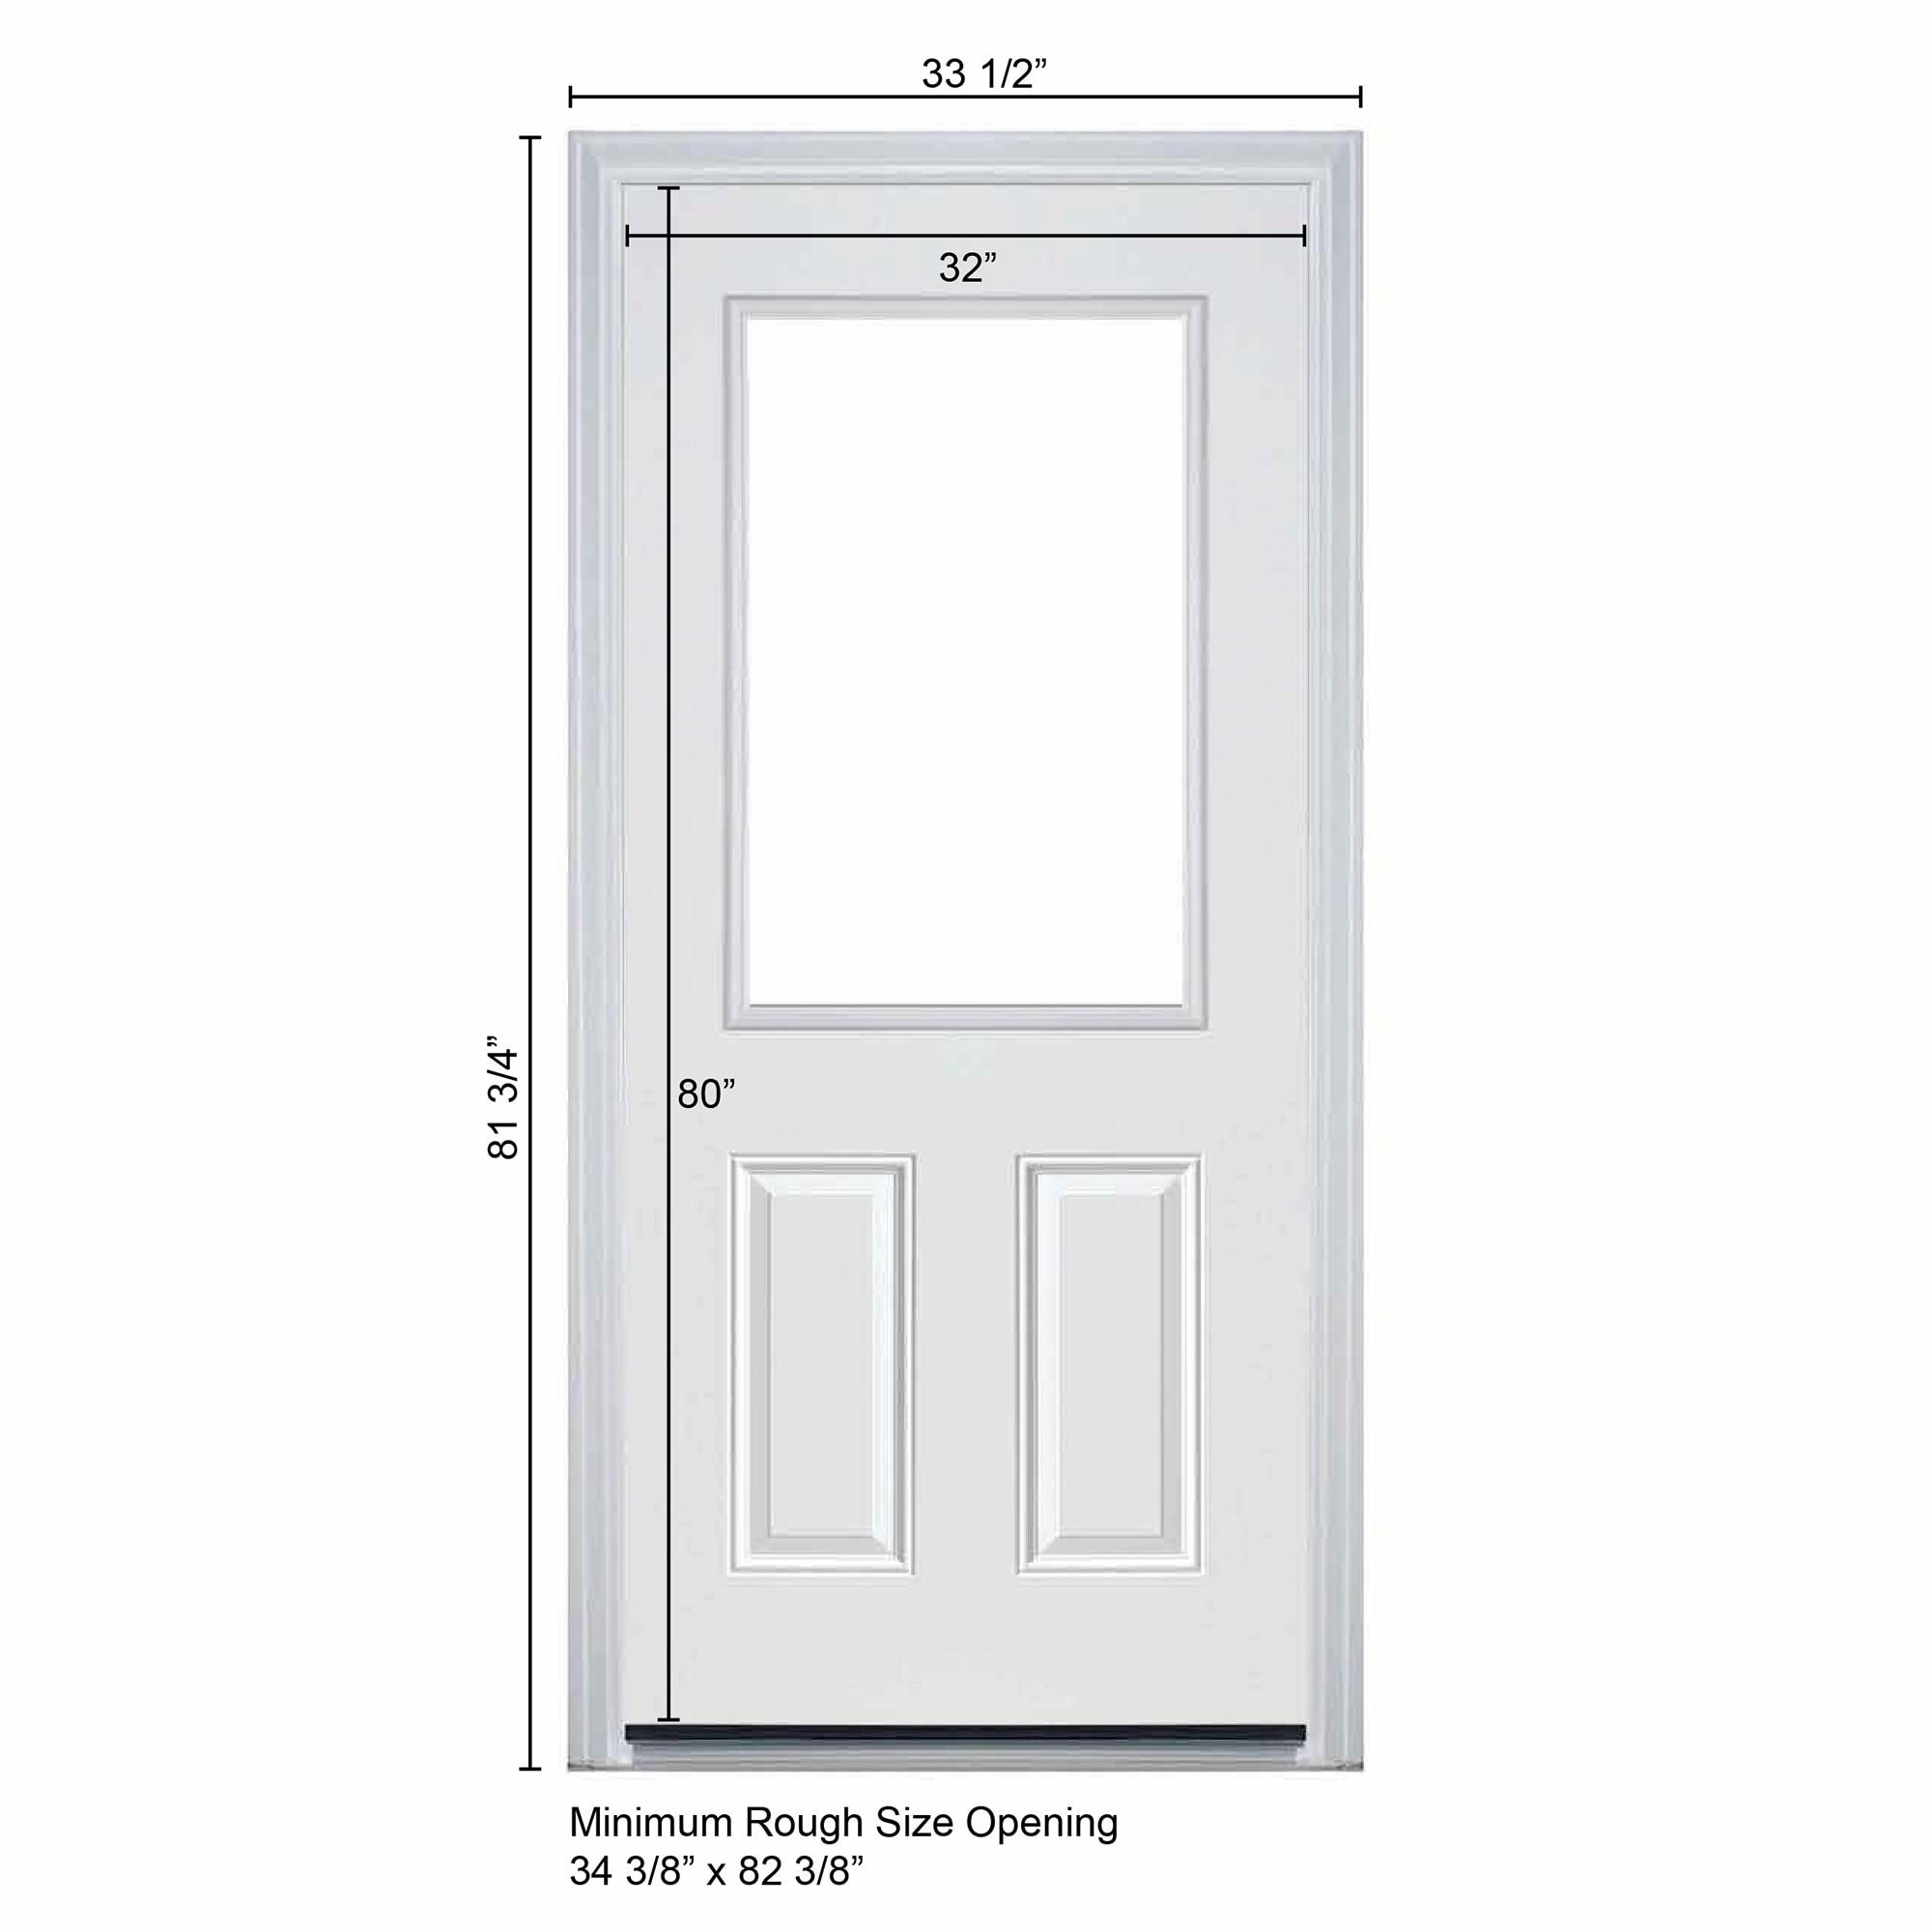 2000 #202128 New Concept Exterior Doors Pre Hung Steel Pandora Collection White  pic Pre Hung Exterior Doors 44512000